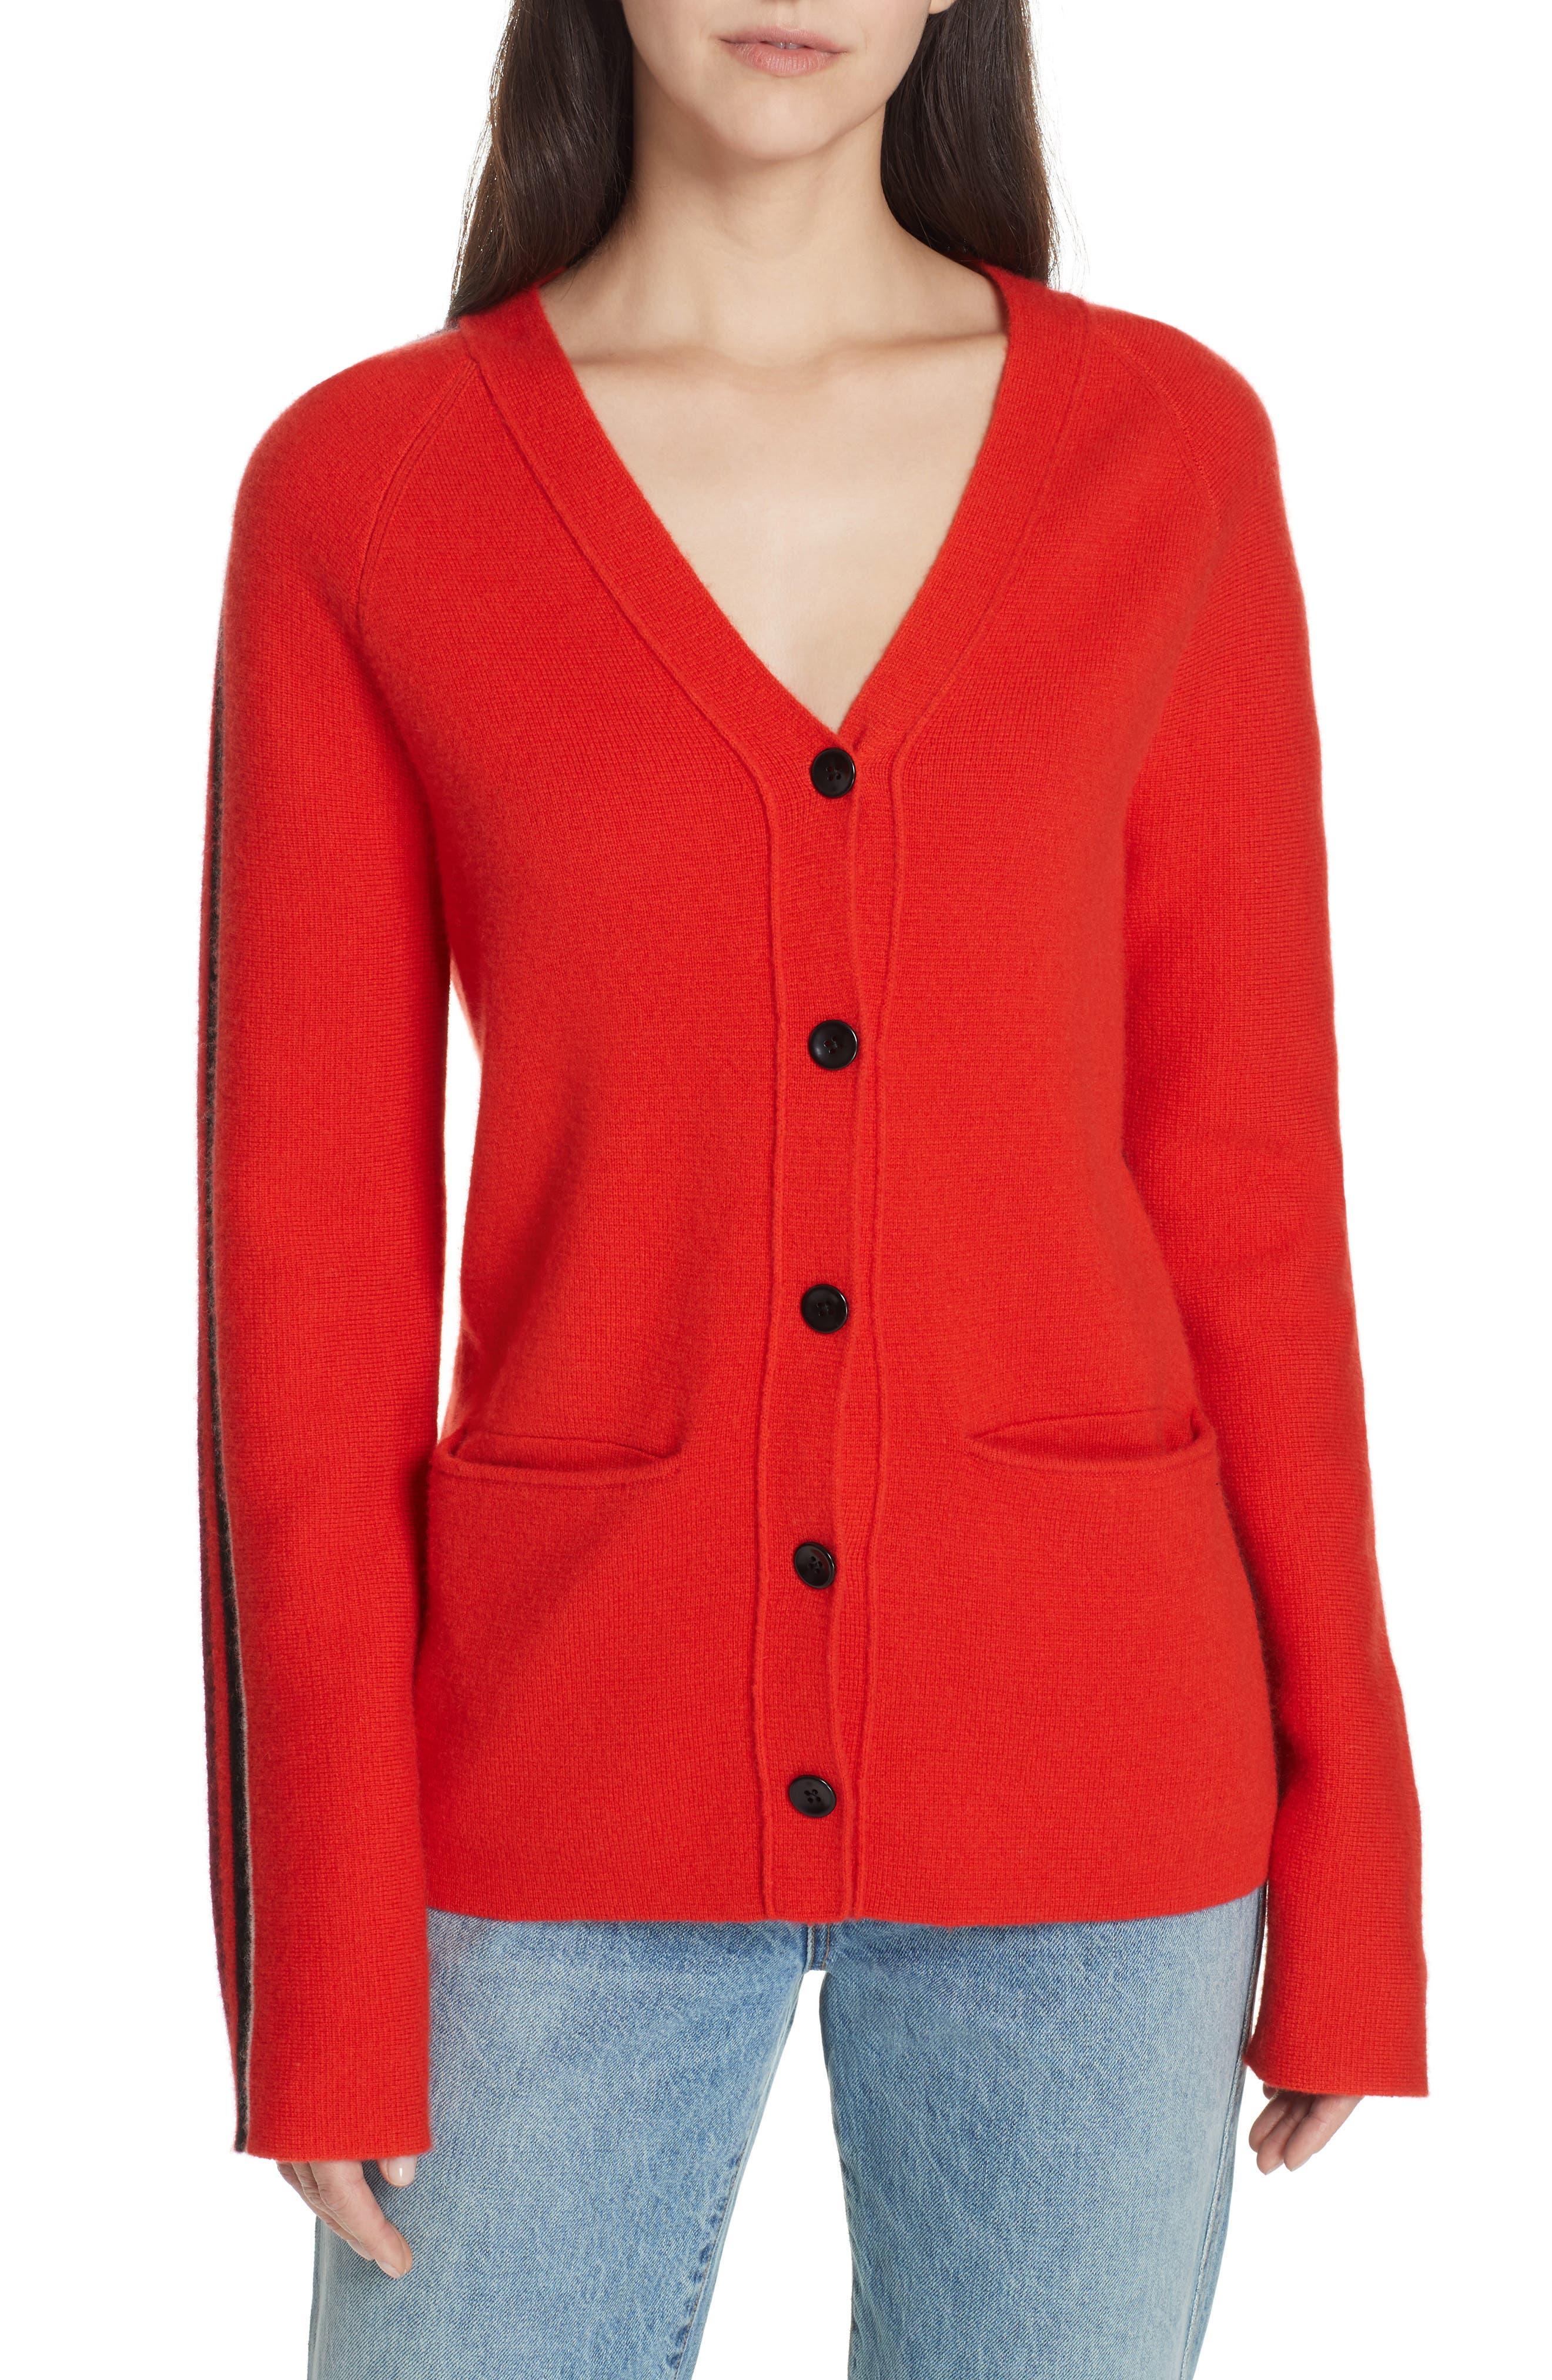 Proenza Schouler Pswl Stripe Sleeve Merino Wool & Cashmere Cardigan, Red